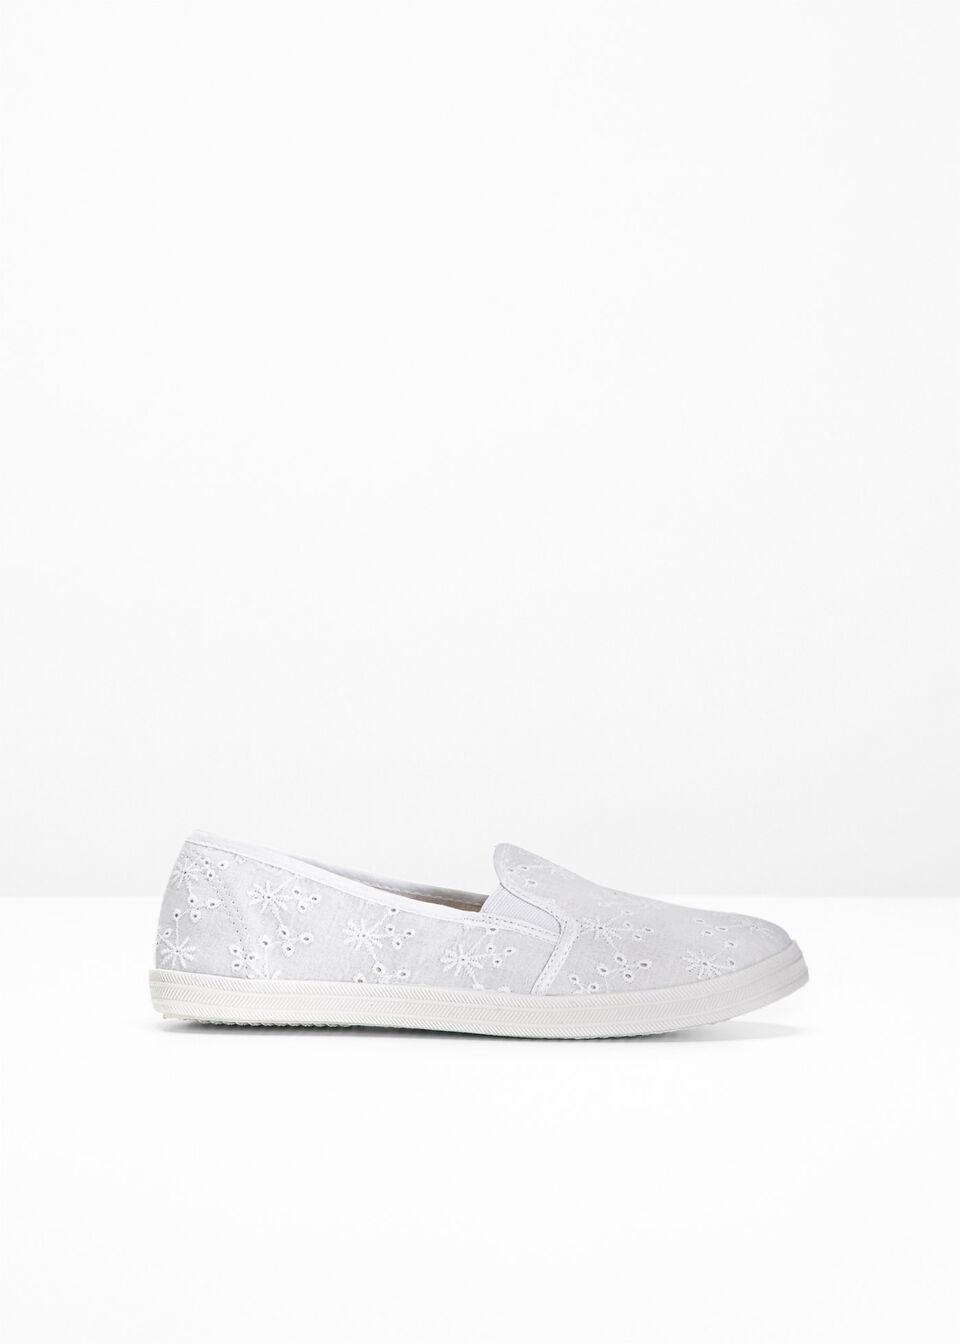 Buty wsuwane bonprix Buty wsuwane biały